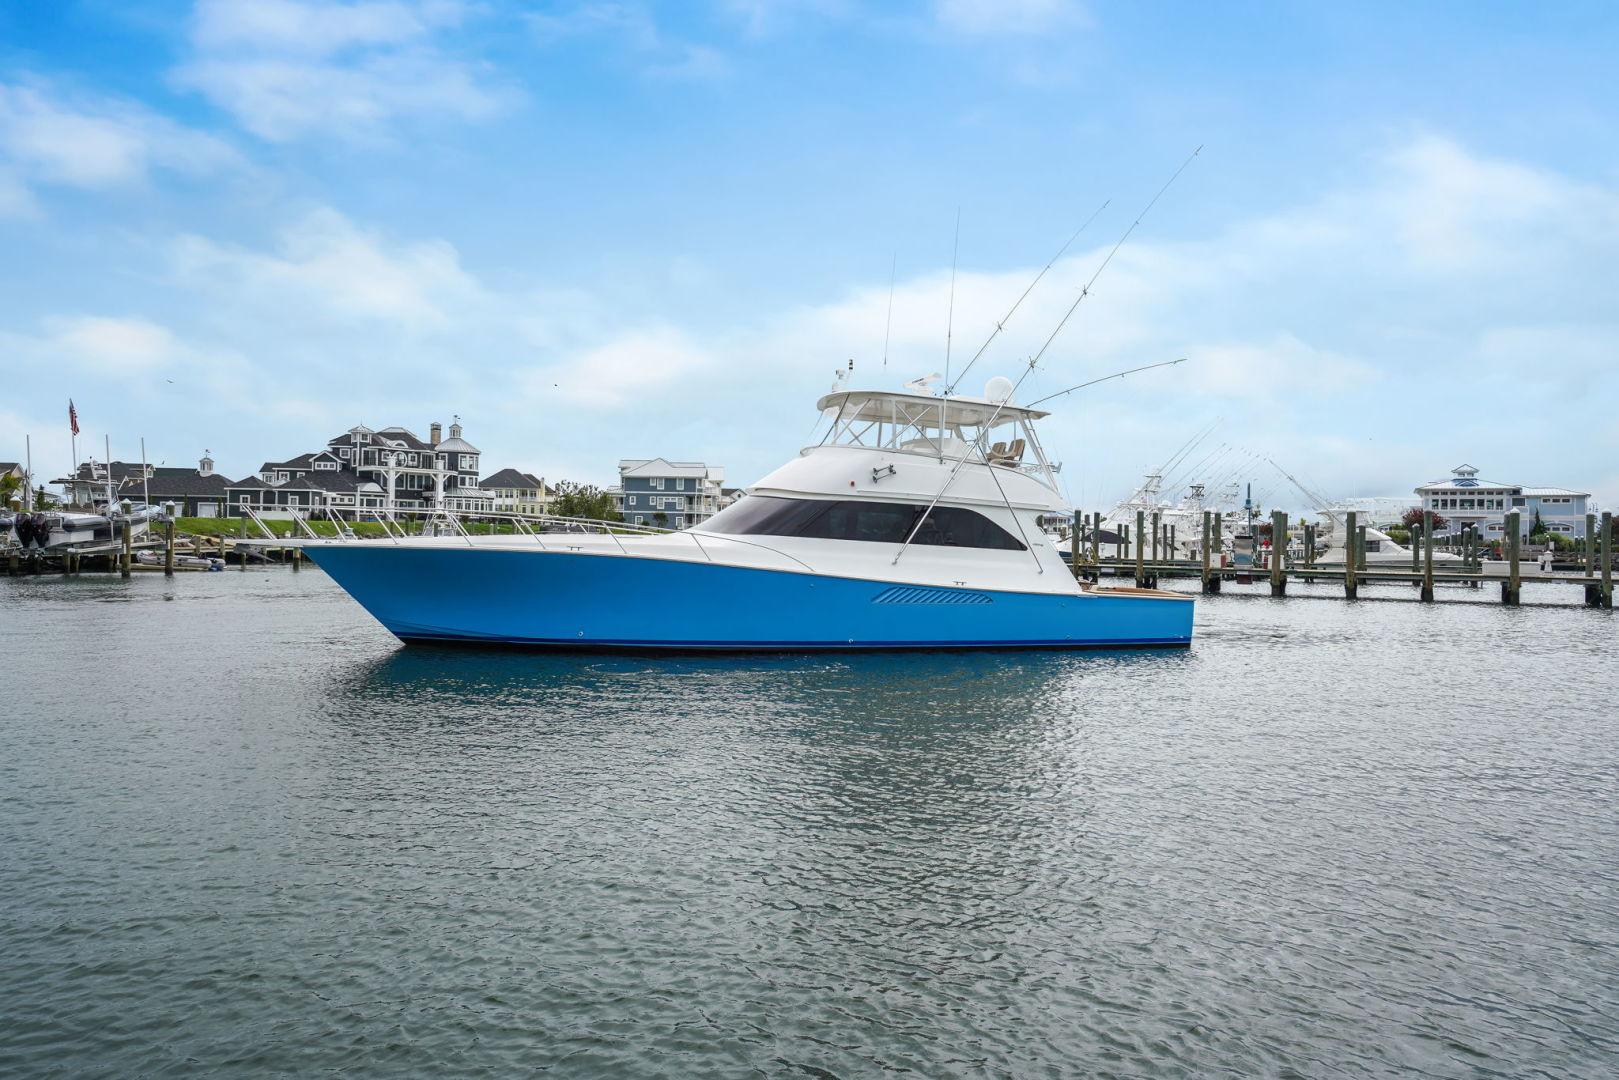 Viking-Convertible 2002-Blue Eyes North Palm Beach-Florida-United States-Blue Eyes-1490414   Thumbnail